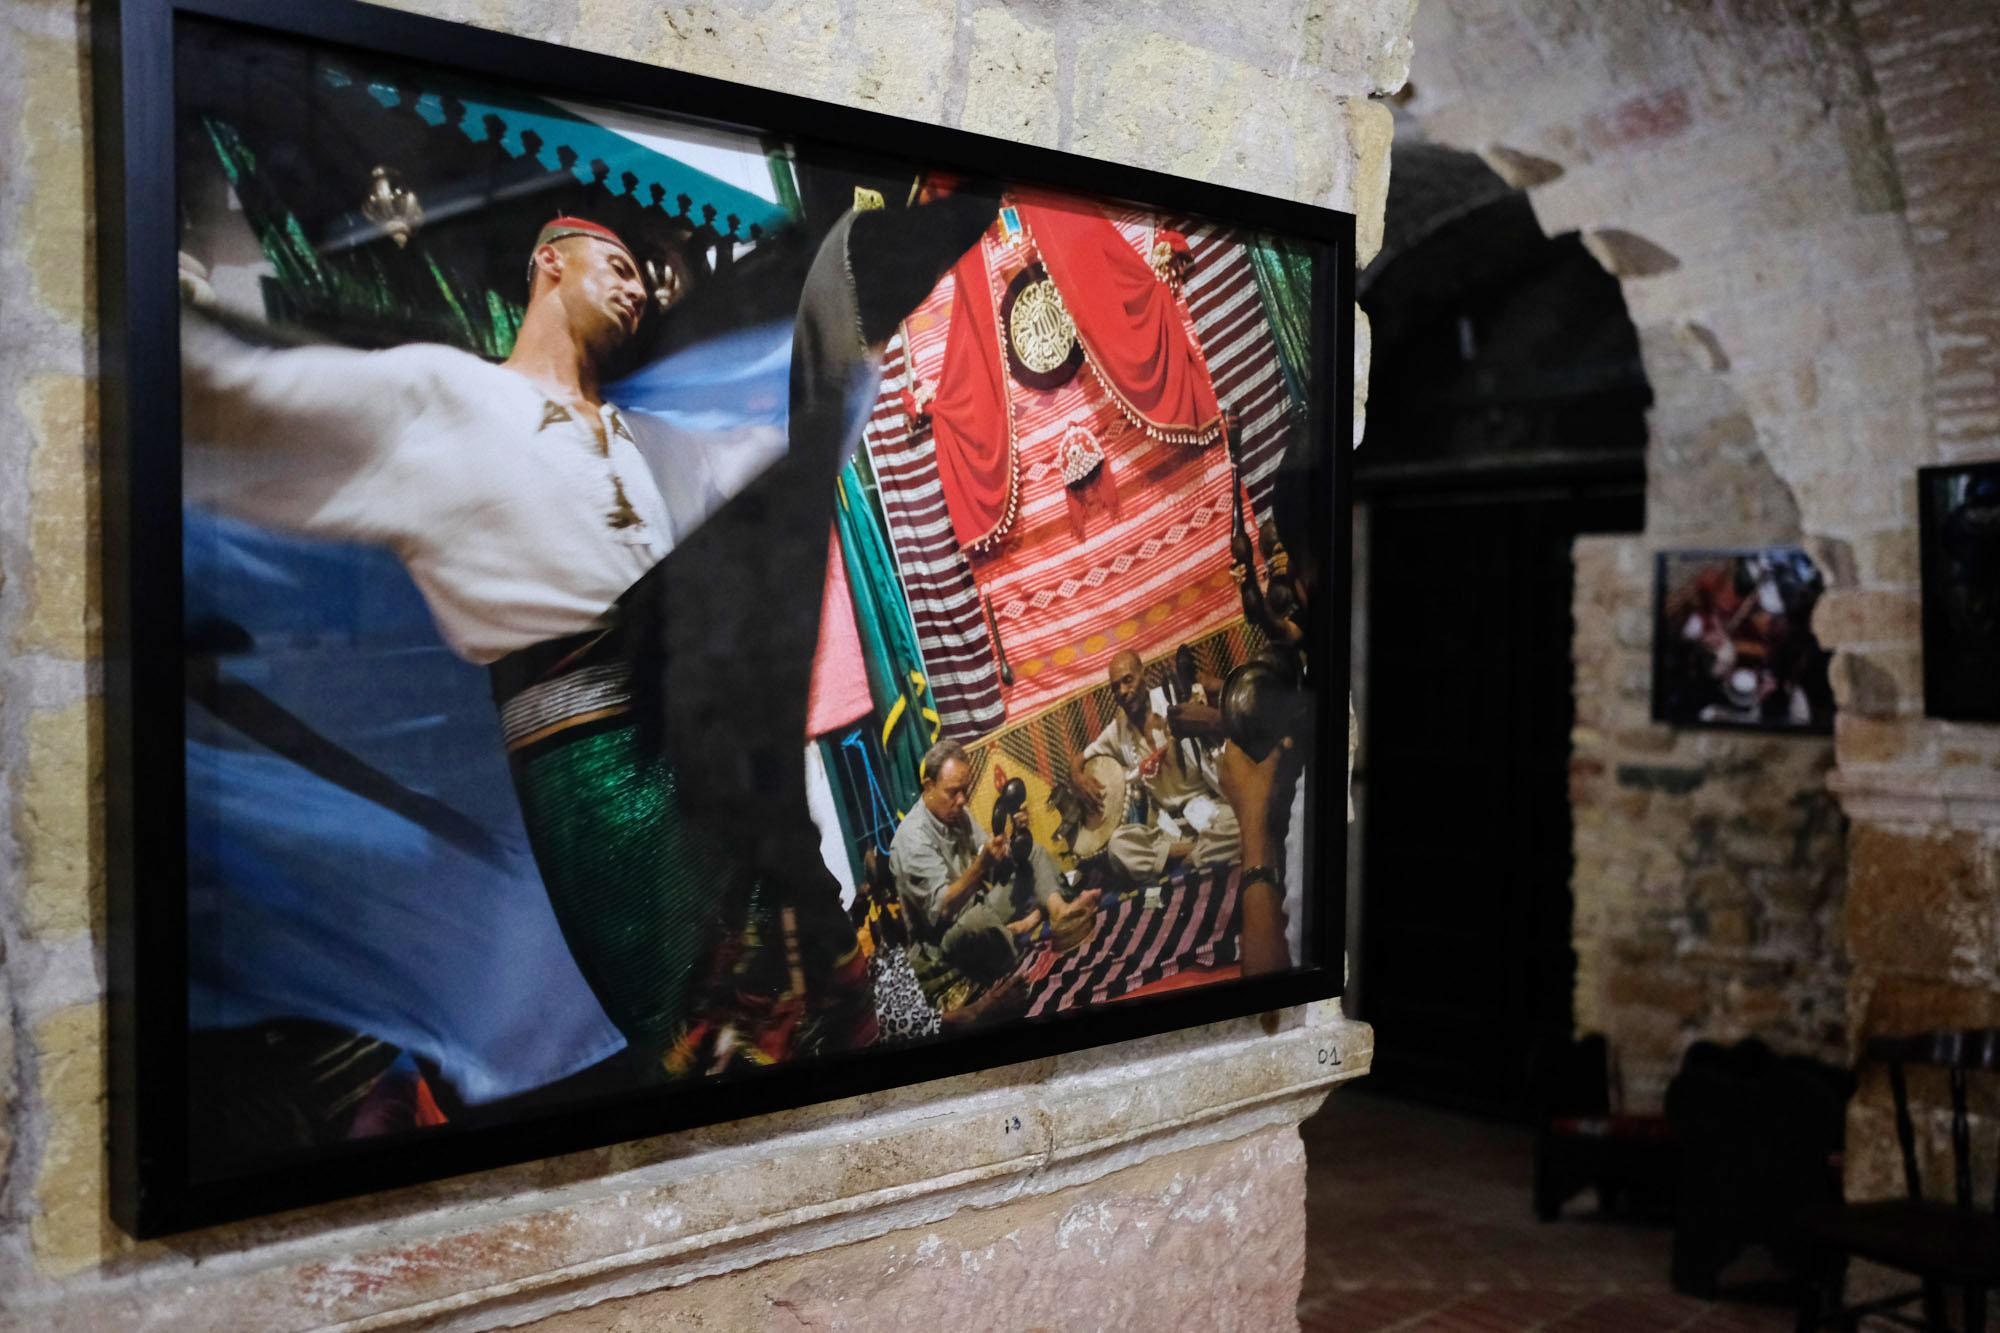 03-201804-TAHAR-HADDAD-EXPOS©AUGUSTIN_LE-GALL_HAYTHAM-PICTURES-DSCF9998.jpg